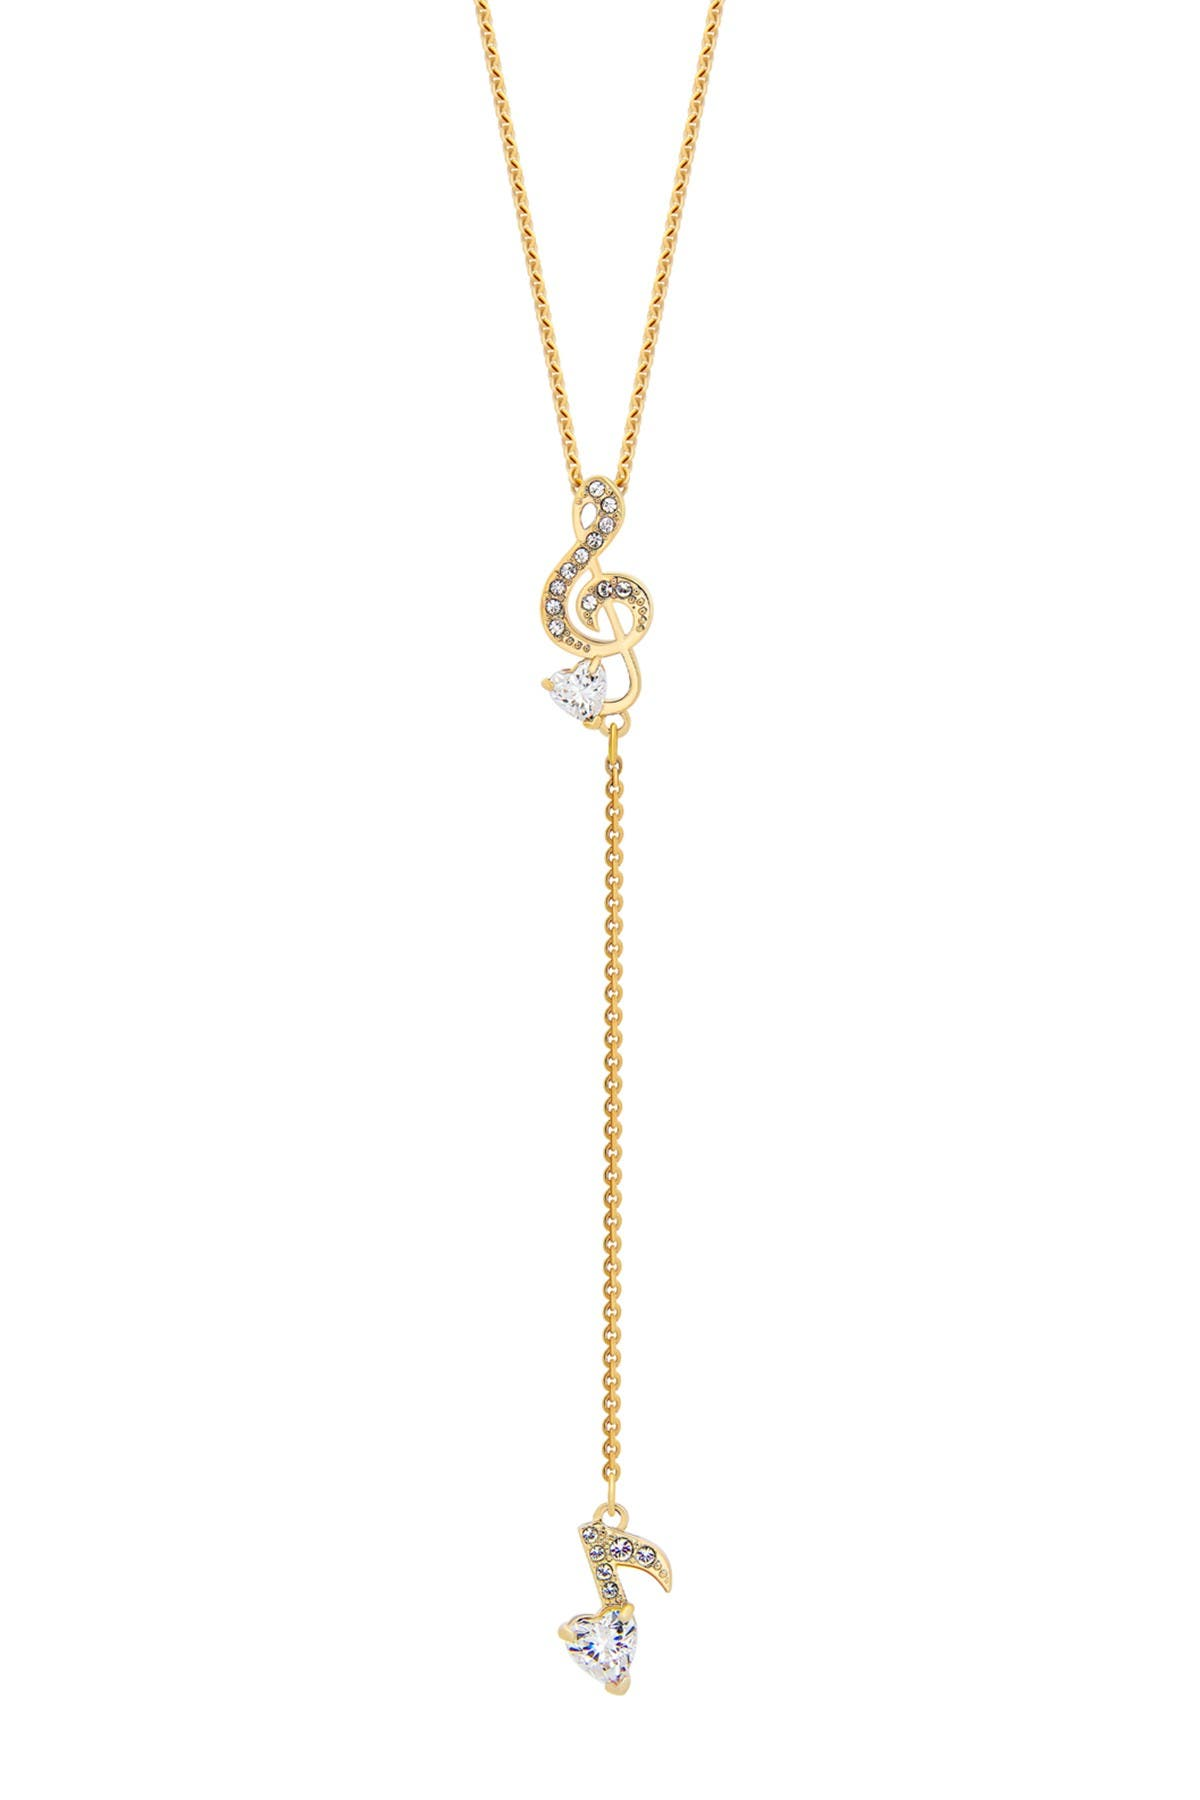 Image of Swarovski Pleasant 23K Yellow Gold Plated Clear Swarovski Crystal Y Pendant Necklace